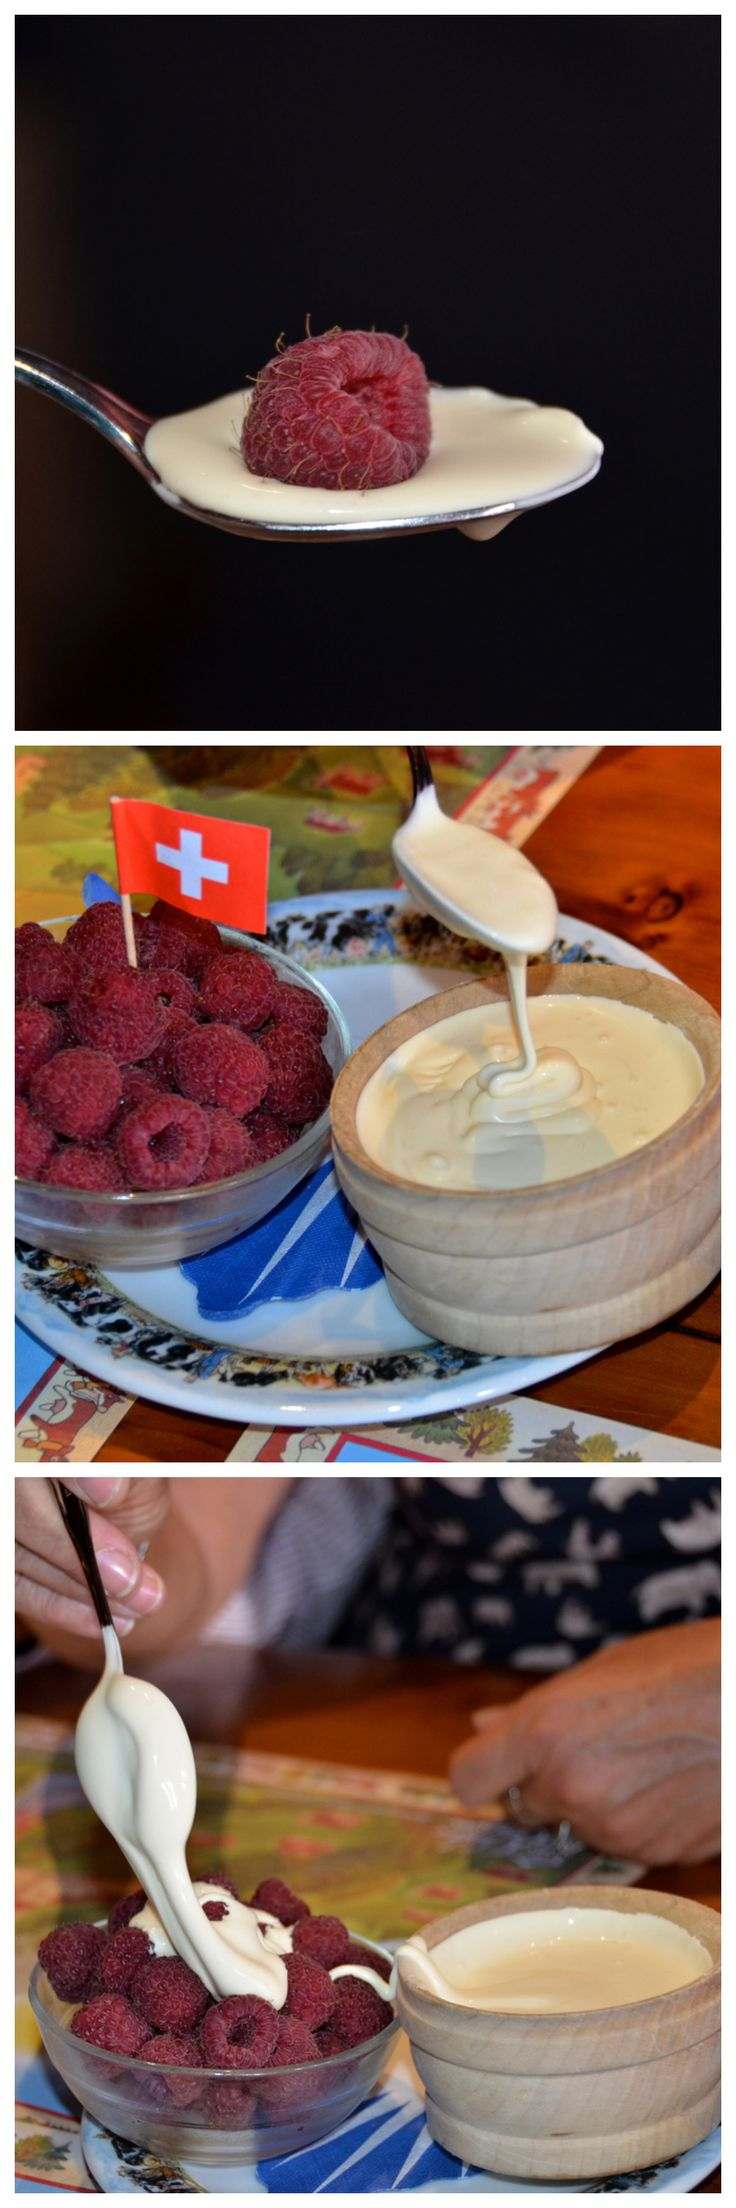 Crème de Gruyère and raspberries at Restaurant Chalet de Gruyères. It is a deliciously thick cream famous for its high butterfat content. #Gruyères #Switzerland